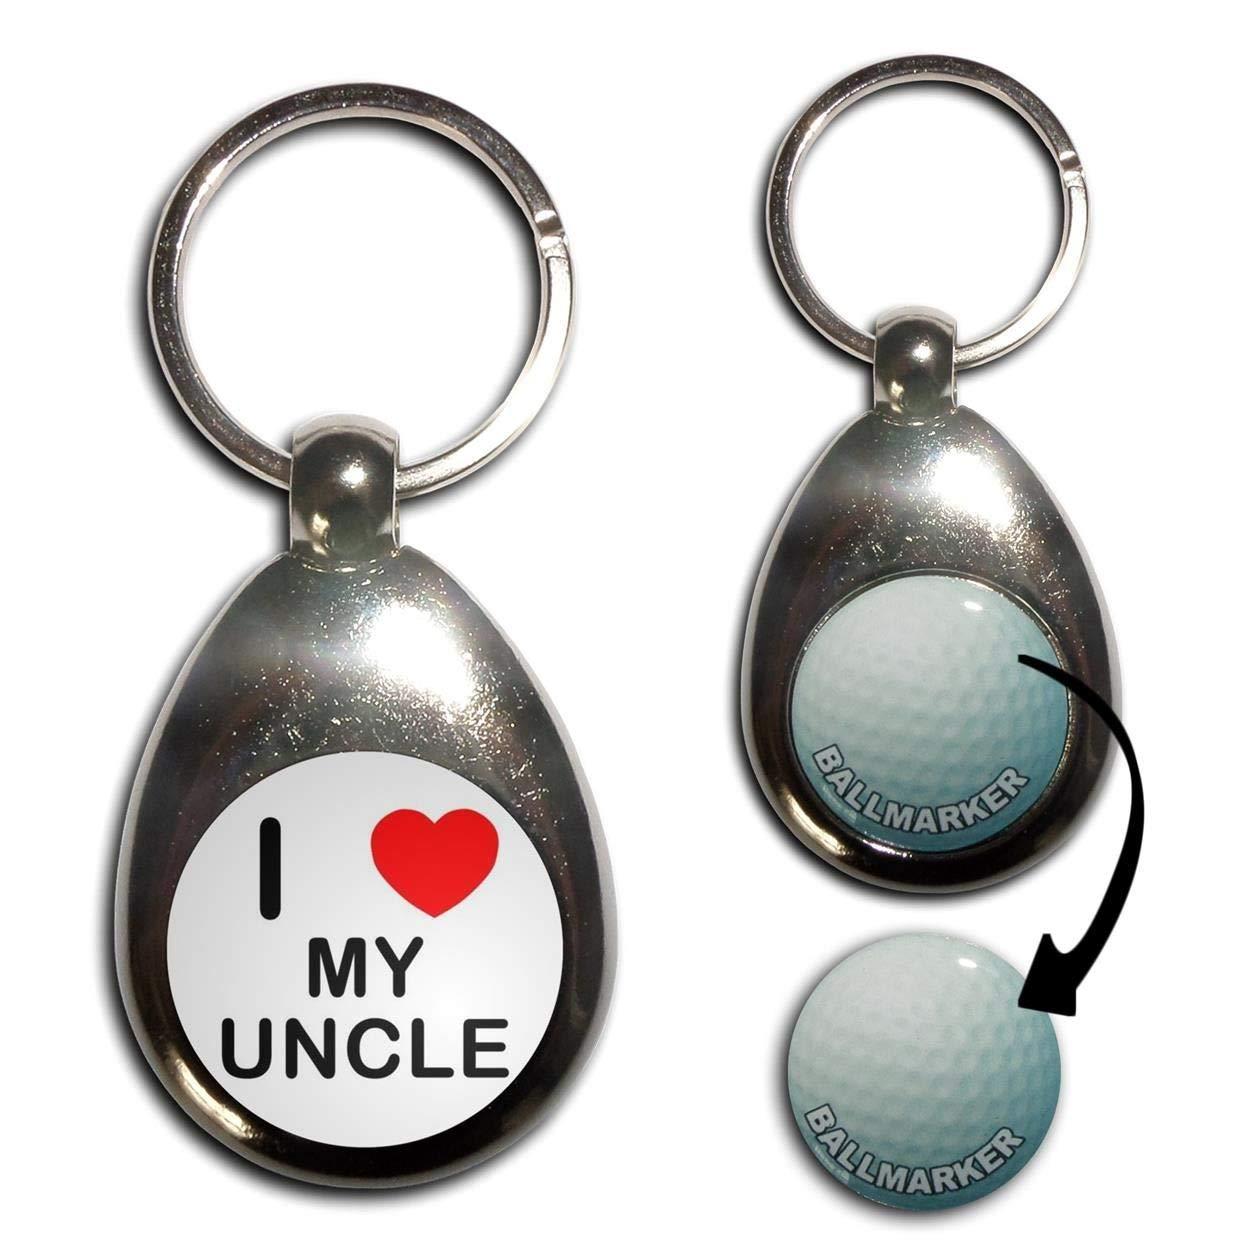 I Heart Love Heart My My Uncle – – ゴルフボールマーカーキーリング B00JCEZVO0, まじめな トナー ショップ:86d23282 --- awardsame.club